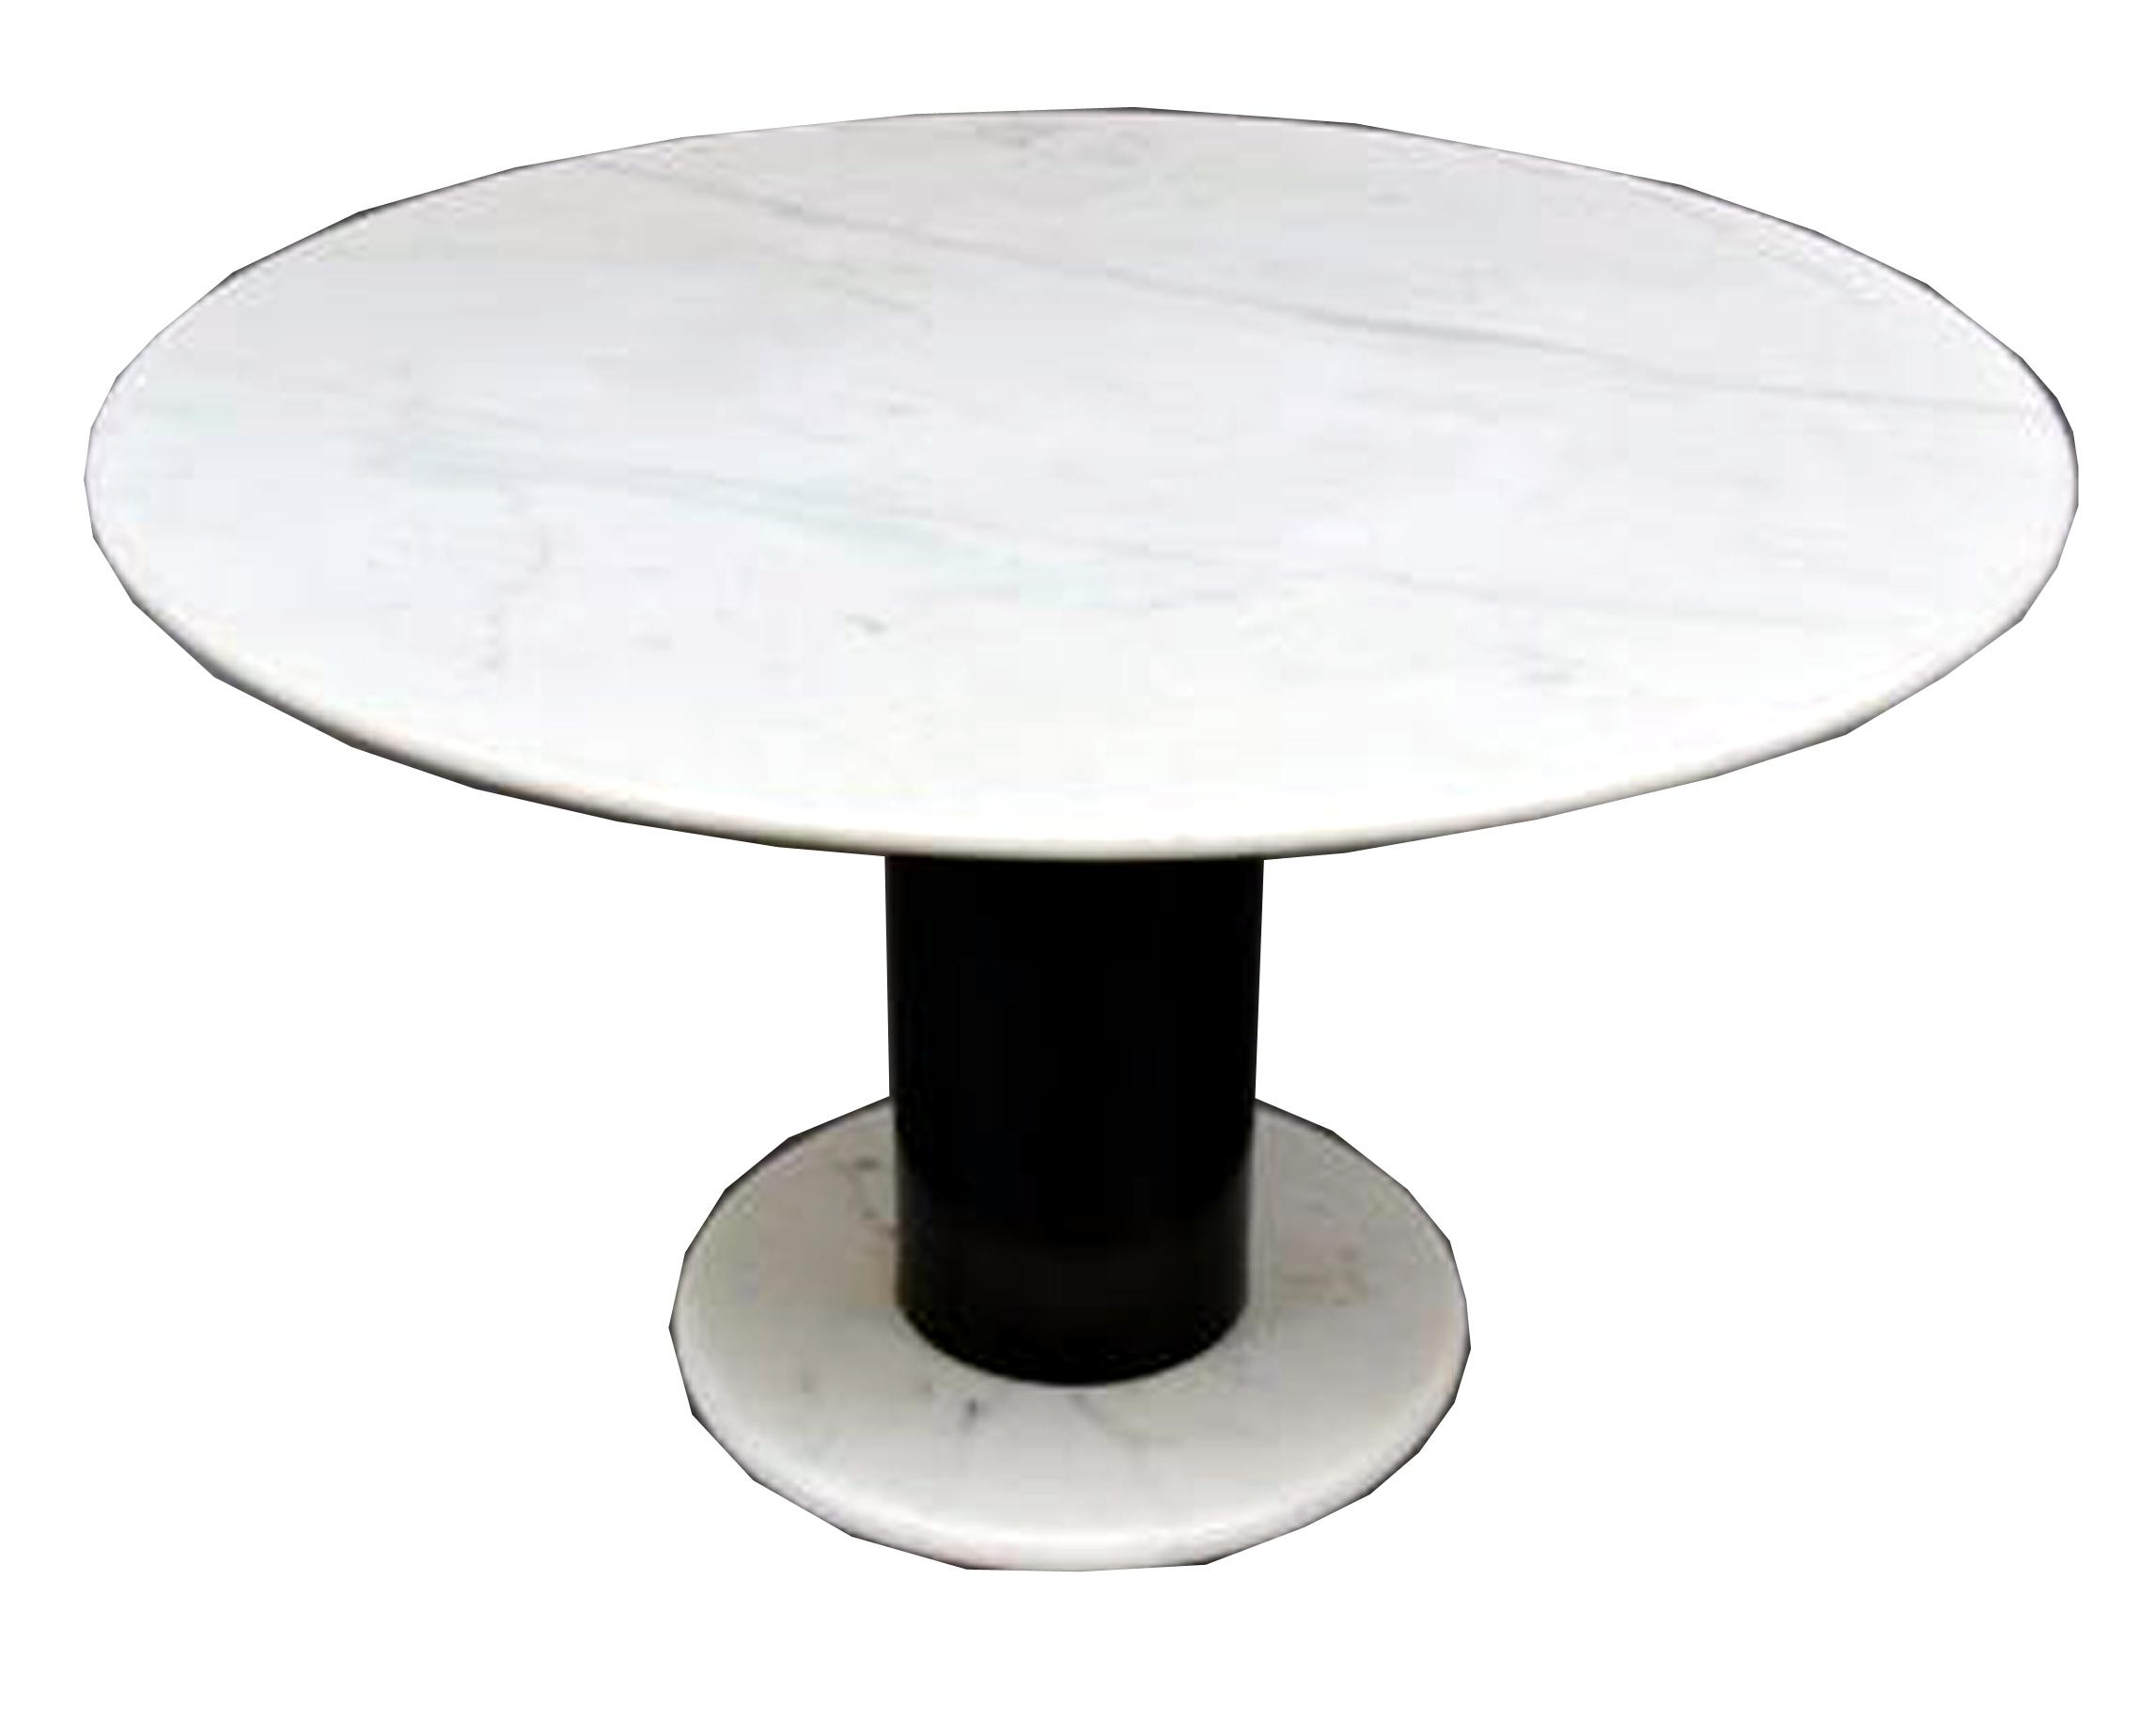 Table Lotorosso Ettore Sottsass Poltronova Modernism